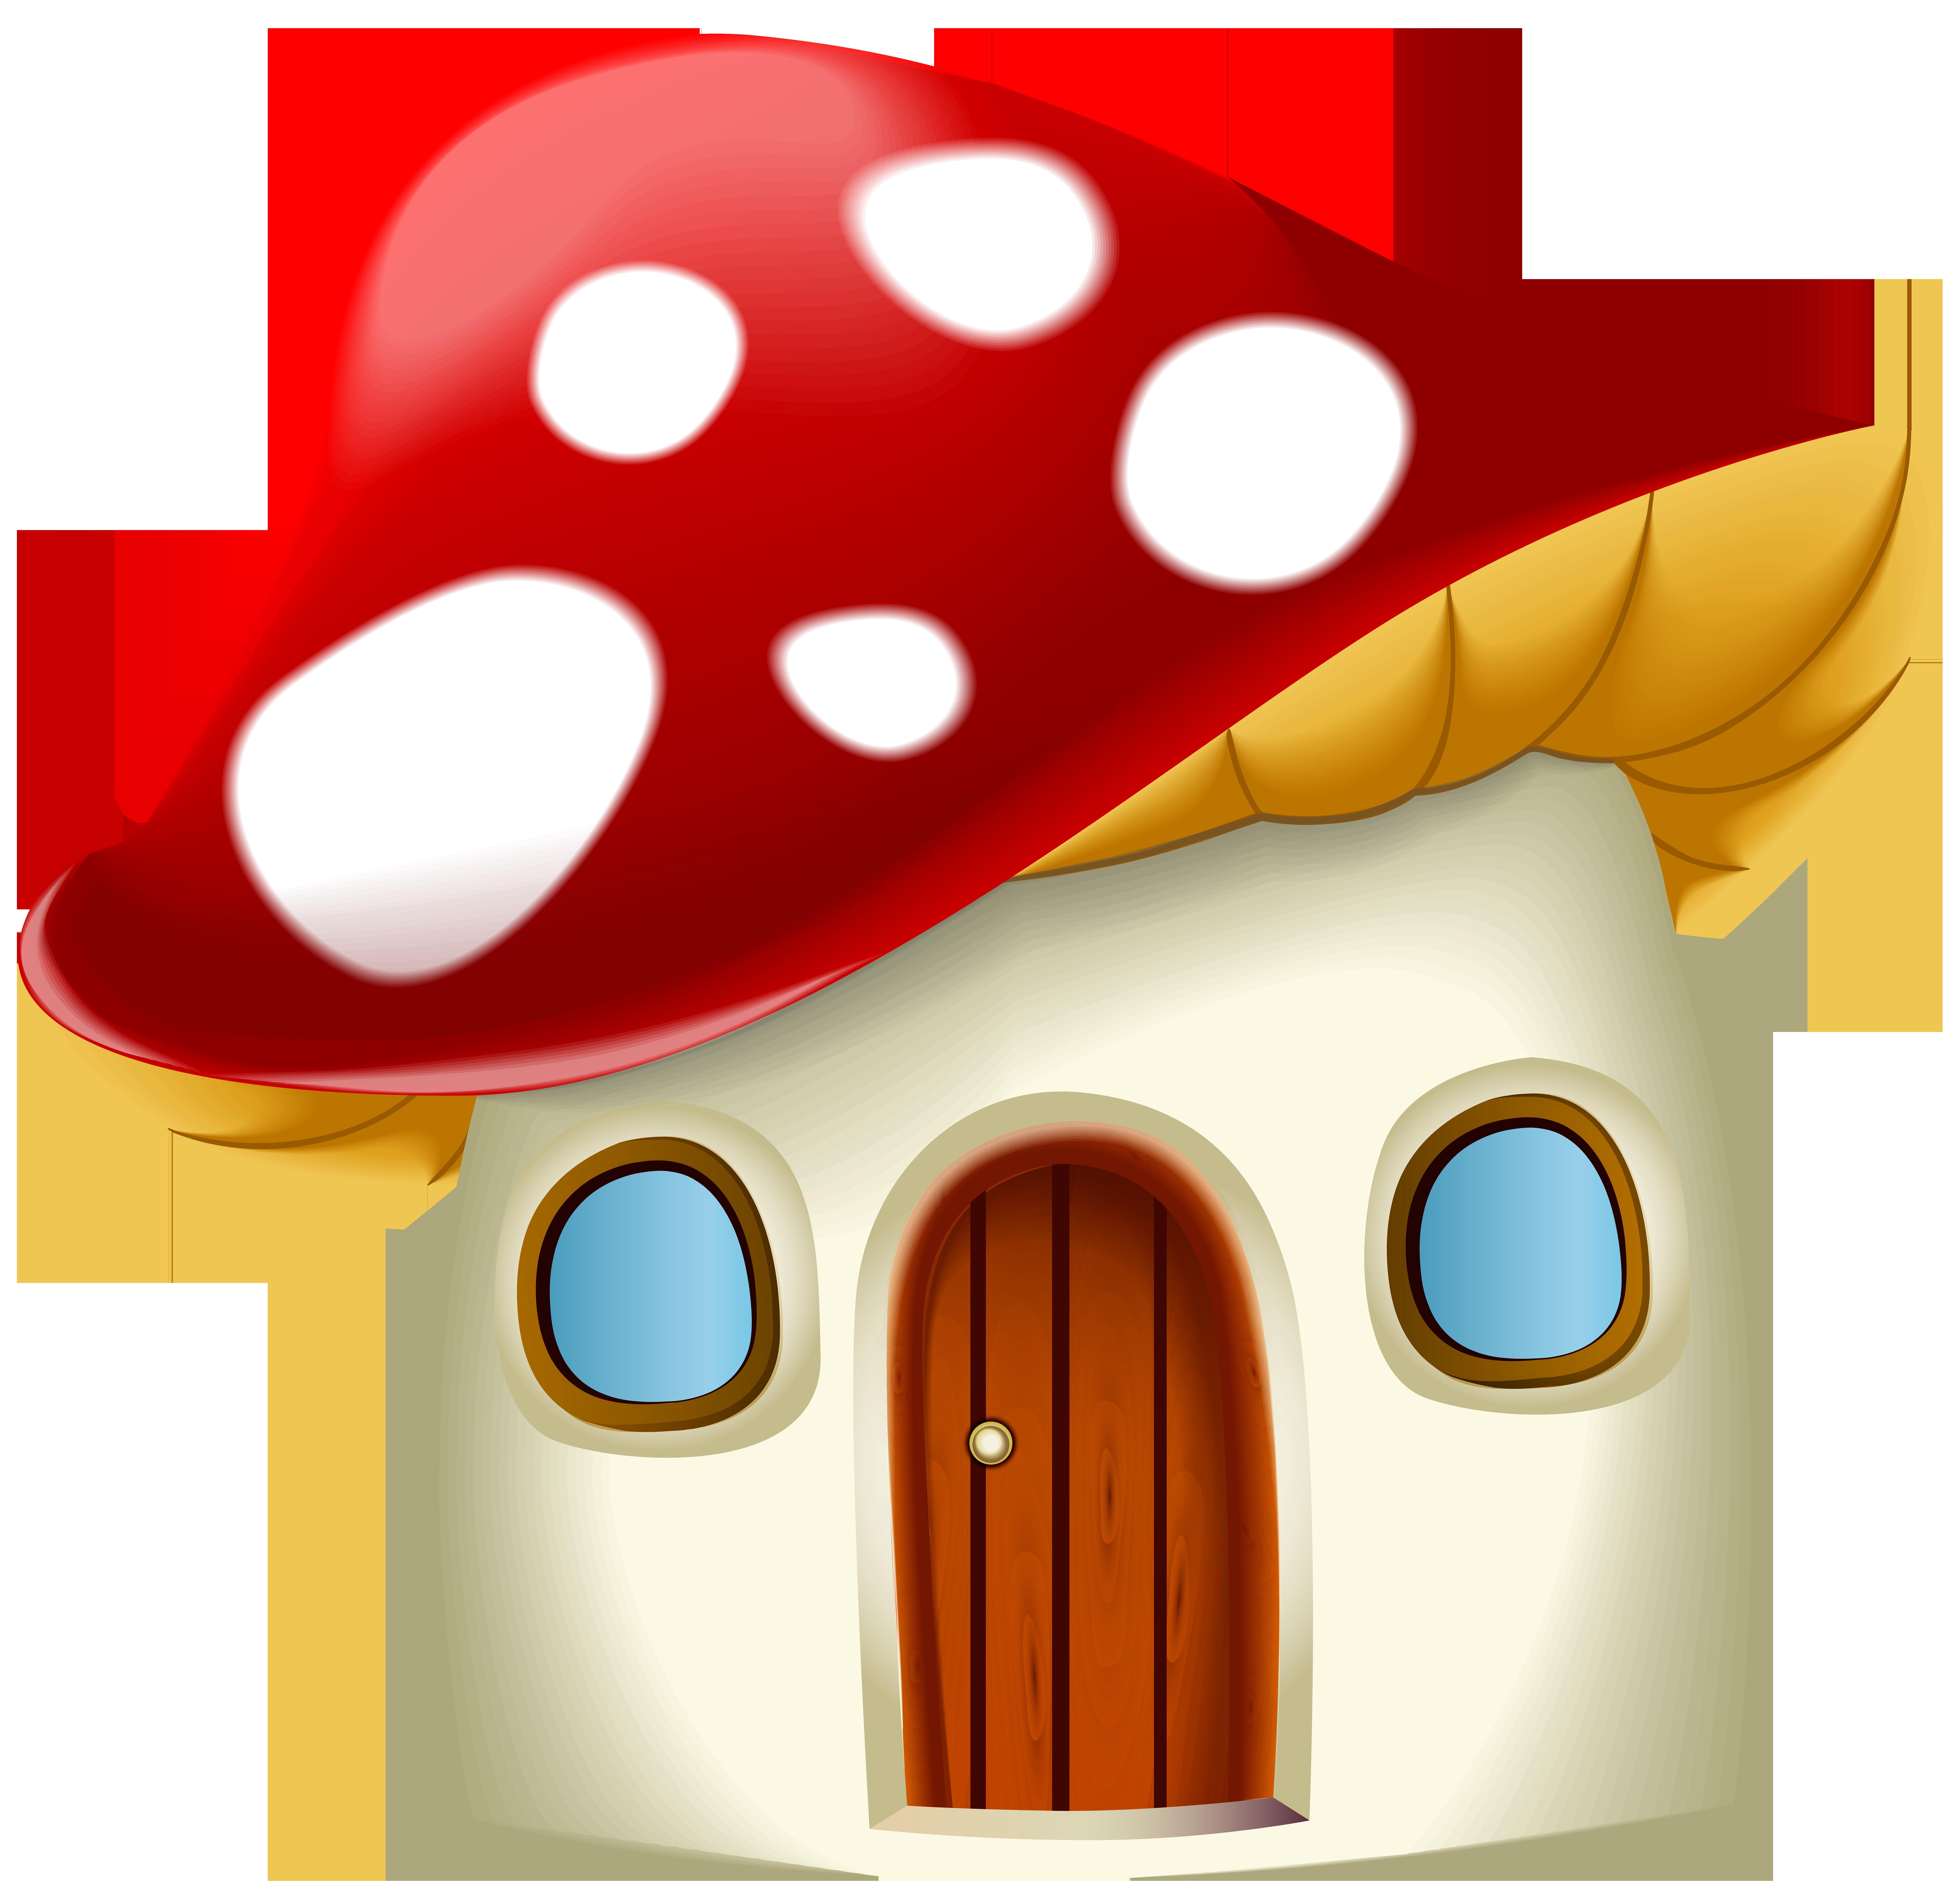 Mushroom house clipart svg transparent Mushroom House Cartoon | Gallery Yopriceville - High-Quality Images ... svg transparent